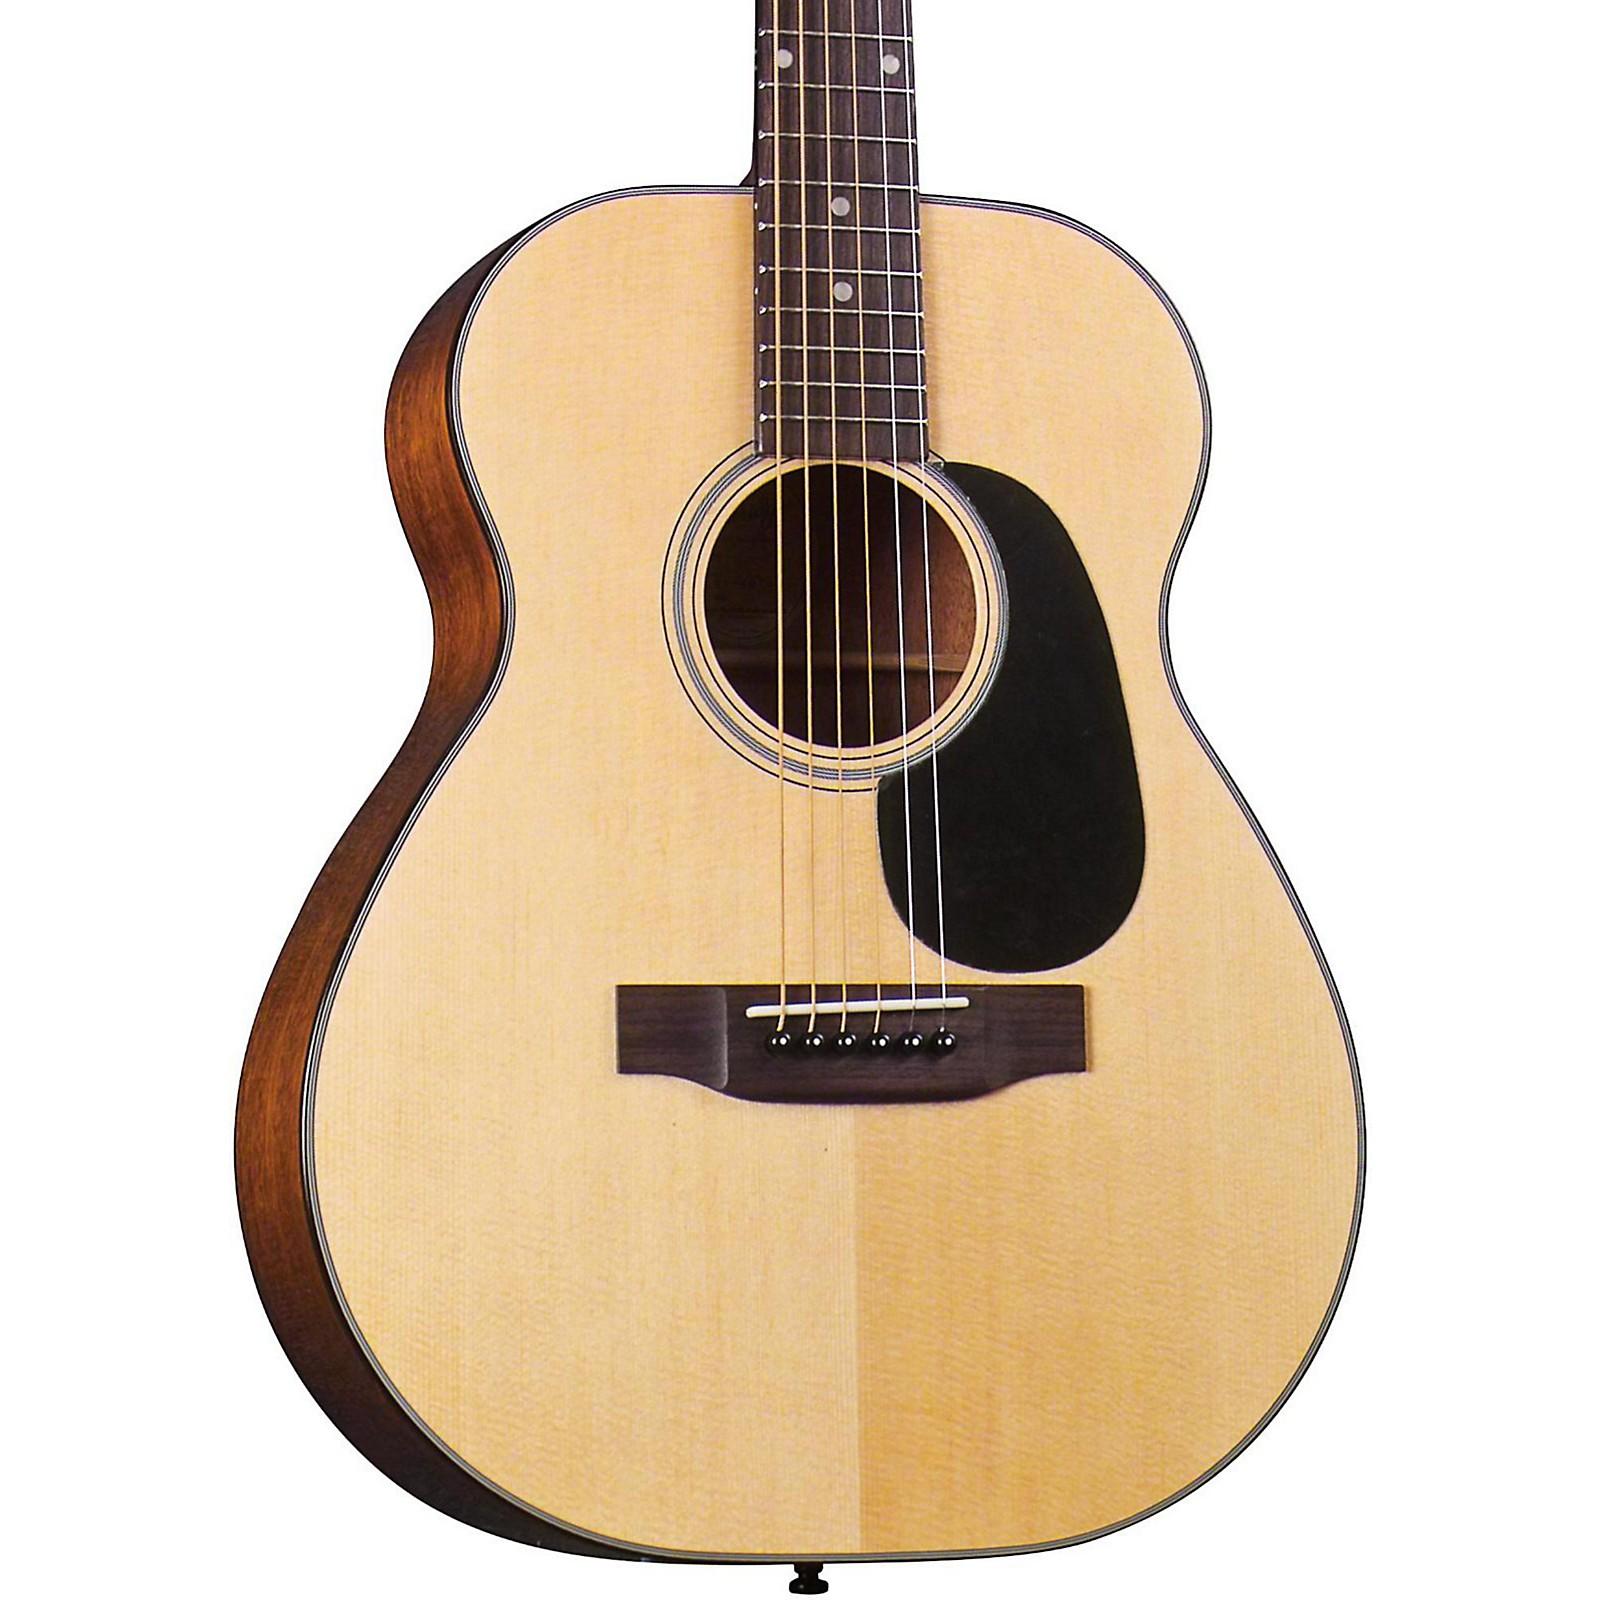 Blueridge BR-41 Contemporary Series Baby Blueridge Acoustic Guitar